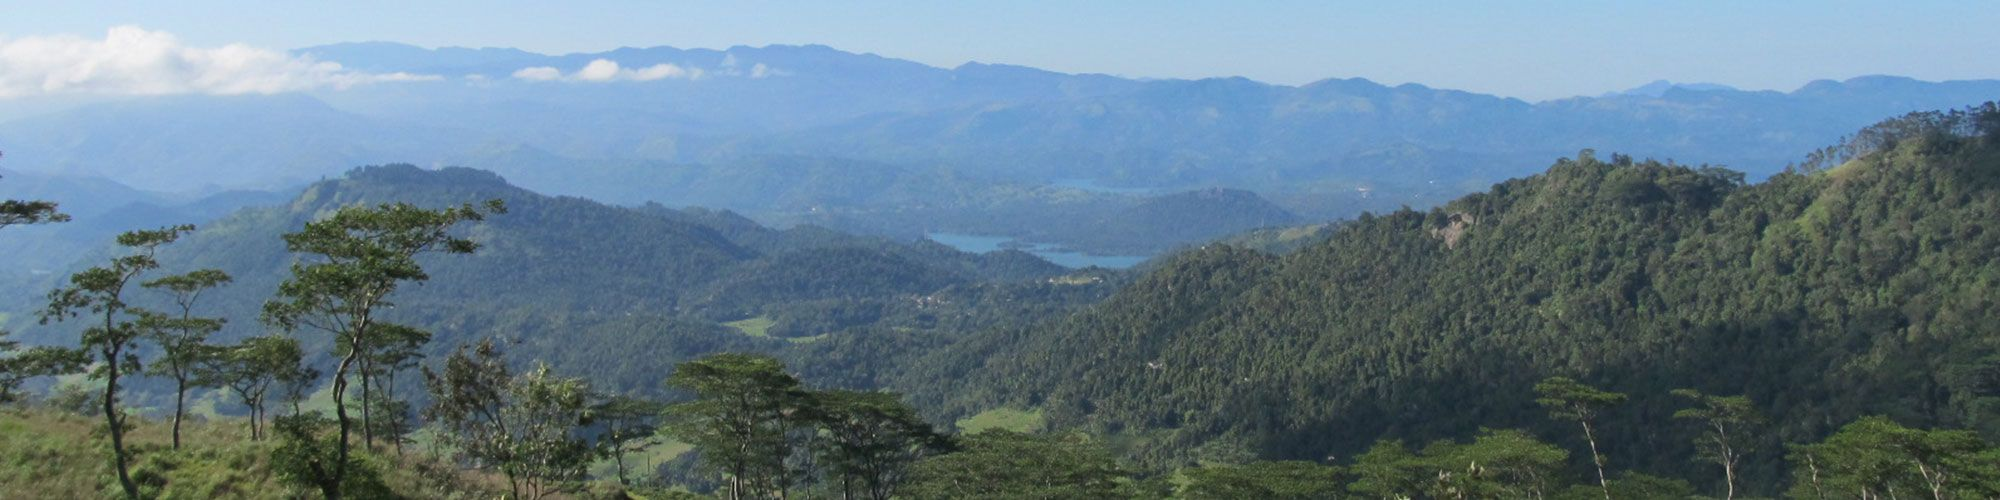 Sri Lanka, Wanderung, Teeplantagen